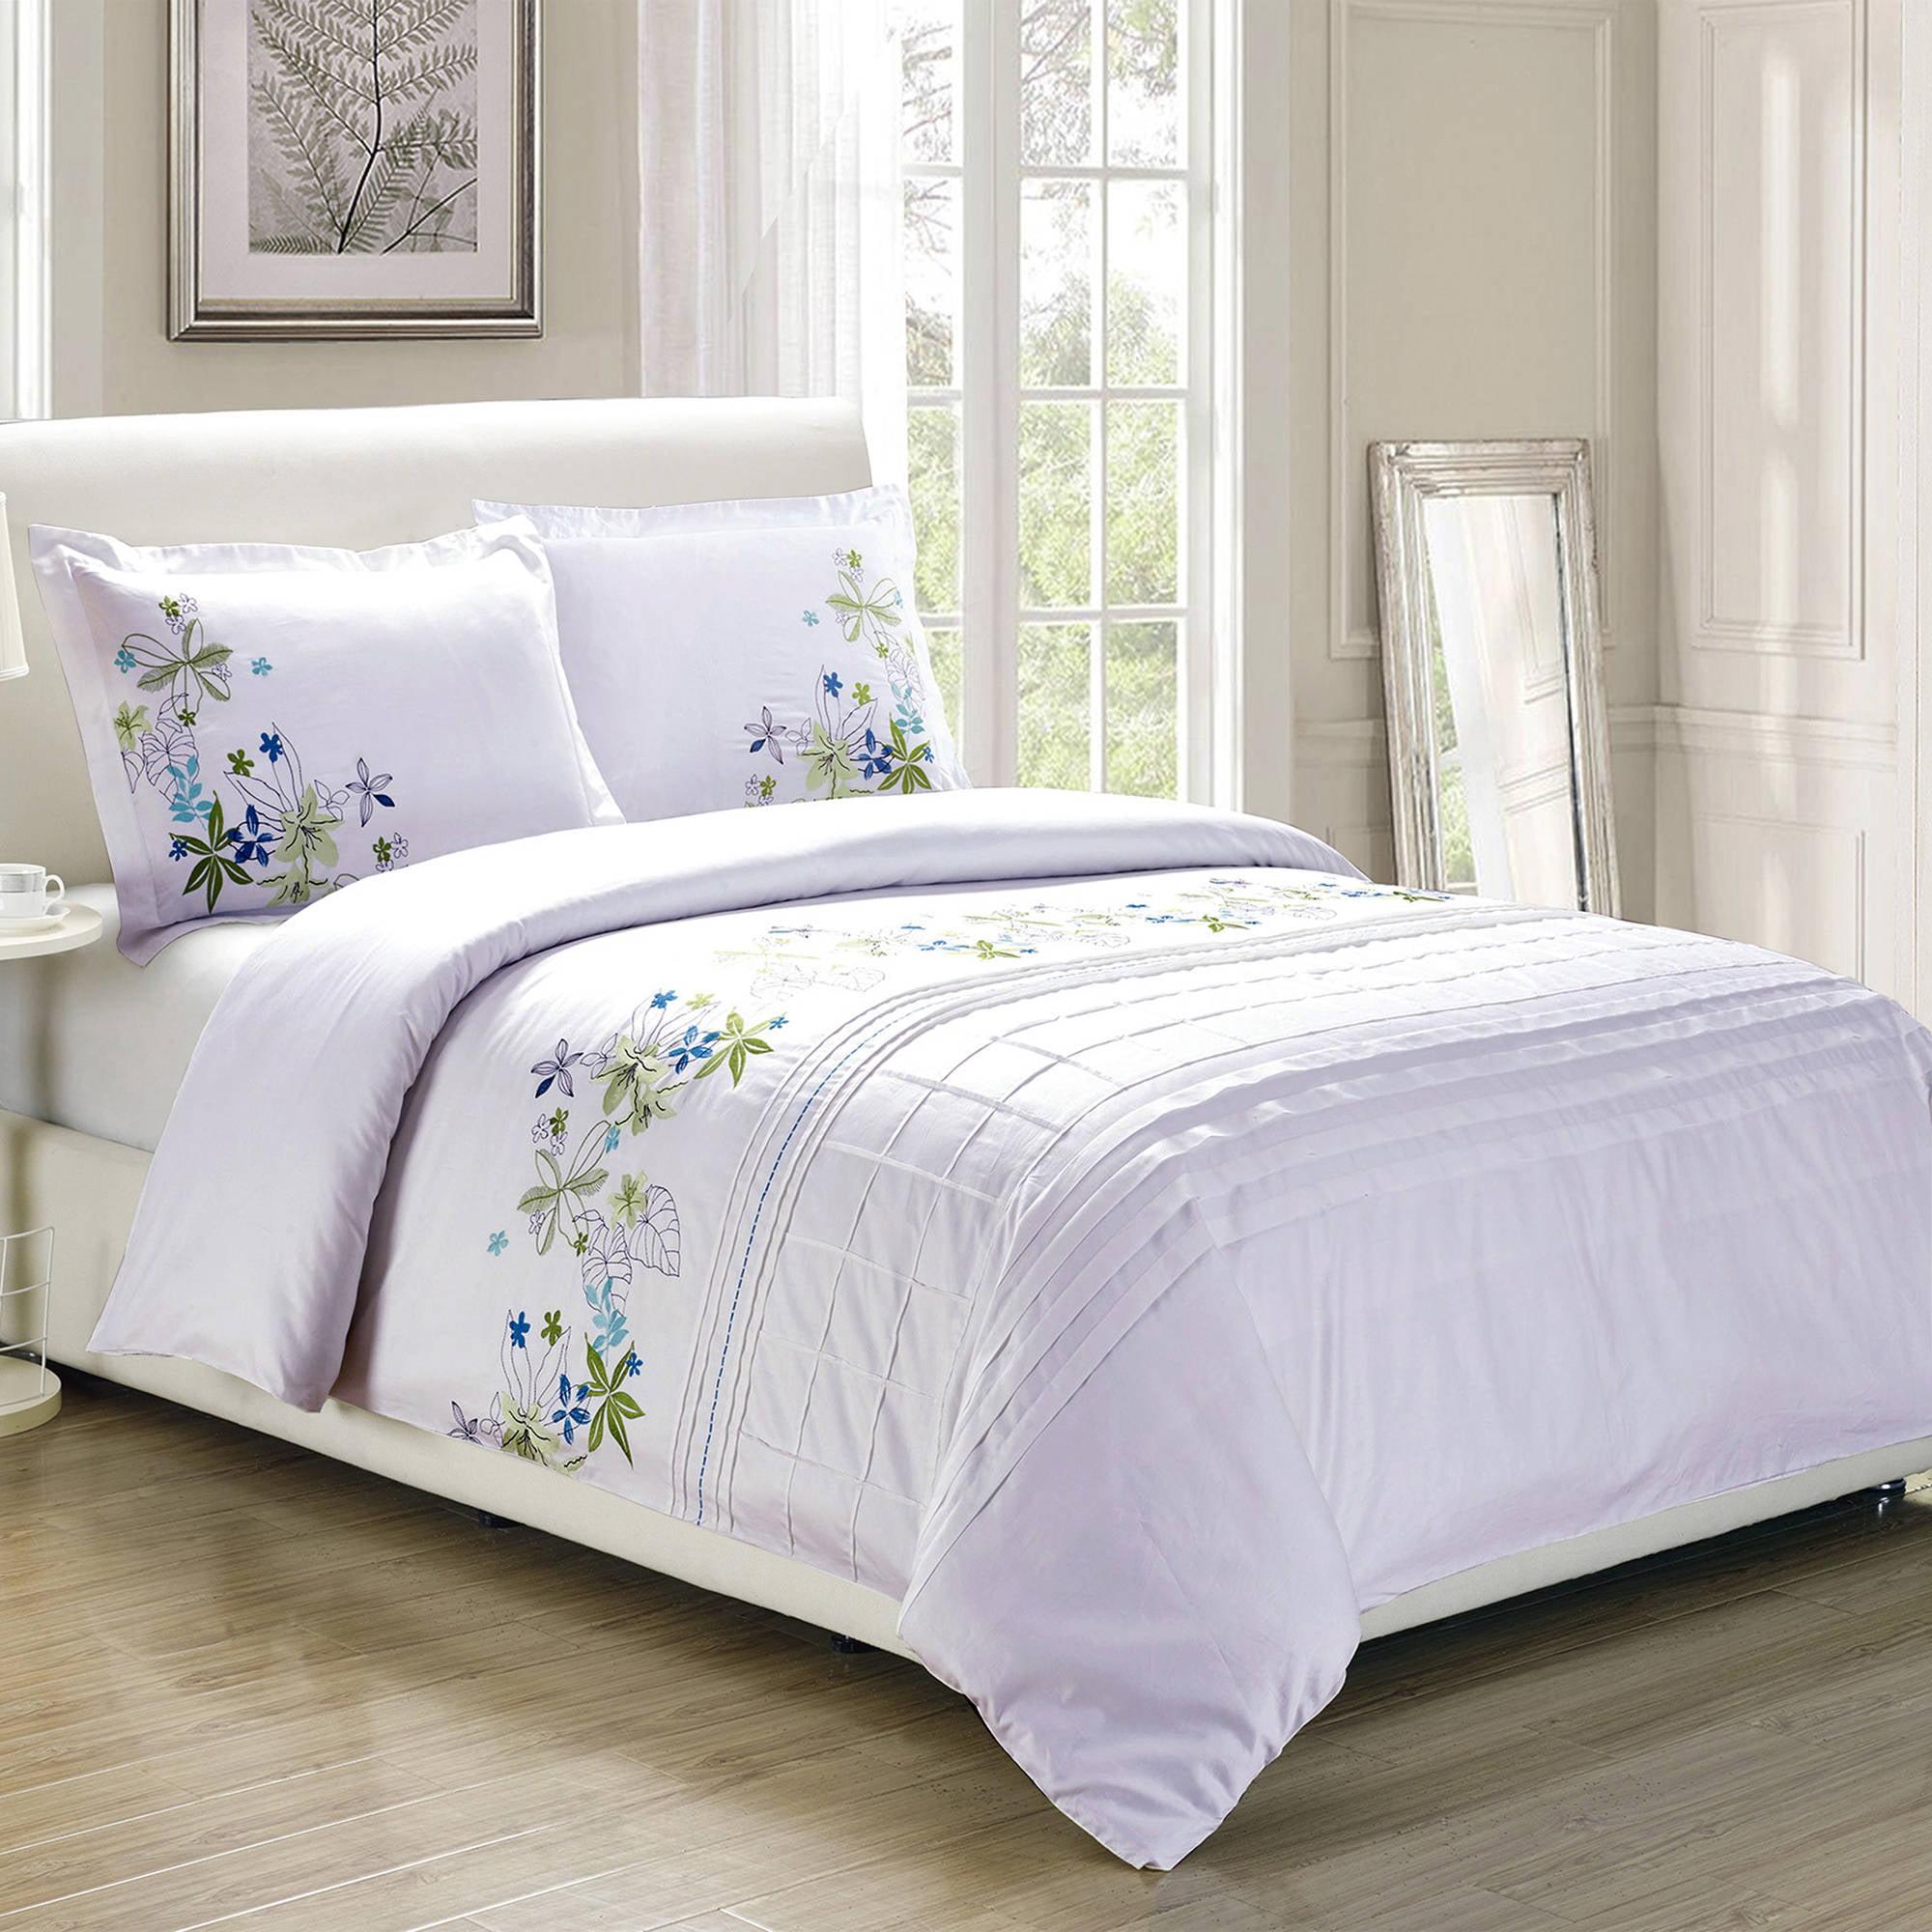 Superior Spring Blooms Premium Cotton Twill Fabric Embroidered Duvet Cover Set